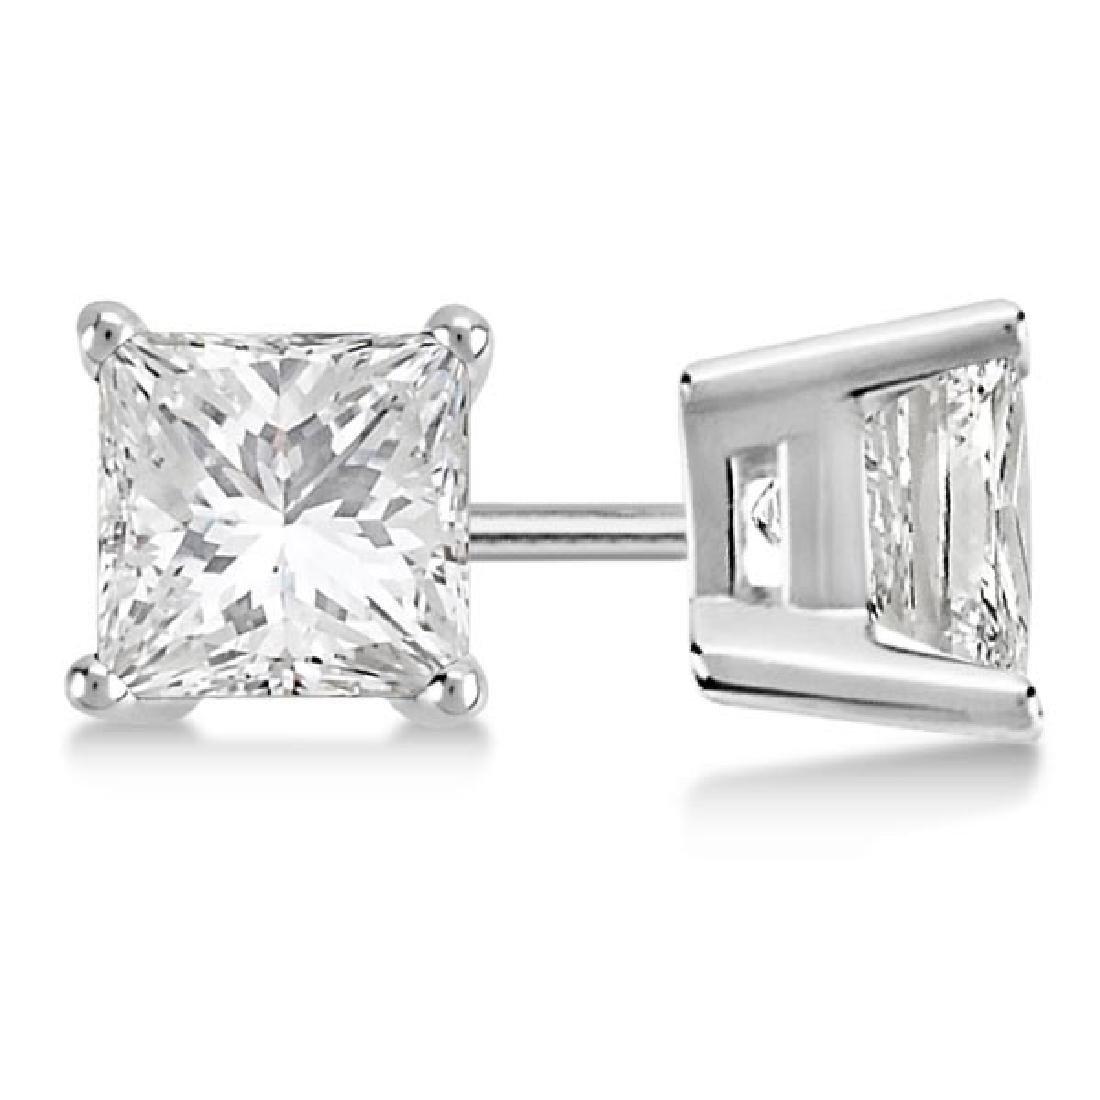 Certified 1.06 CTW Princess Diamond Stud Earrings D/SI2